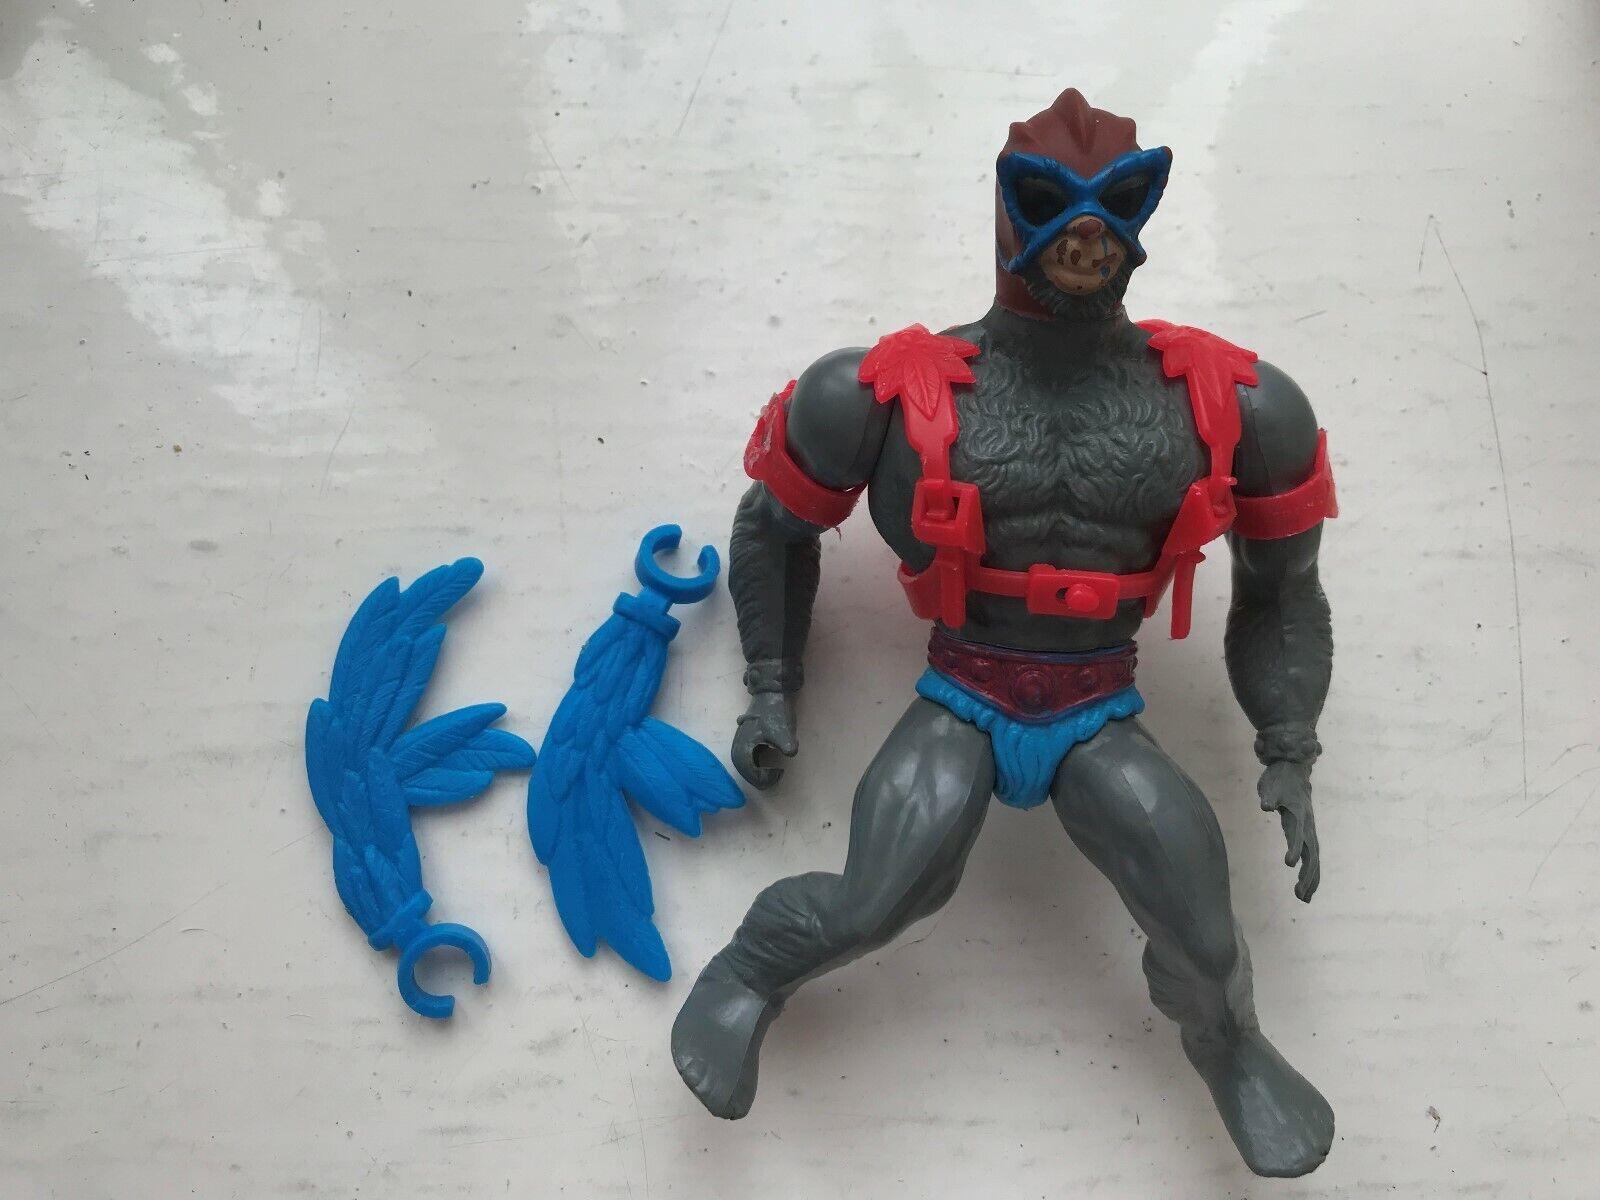 80S ORIGINAL MATTEL HE-MAN MOTU MASTERS OF THE UNIVERSE STRATOS FIGURE COMPLETE